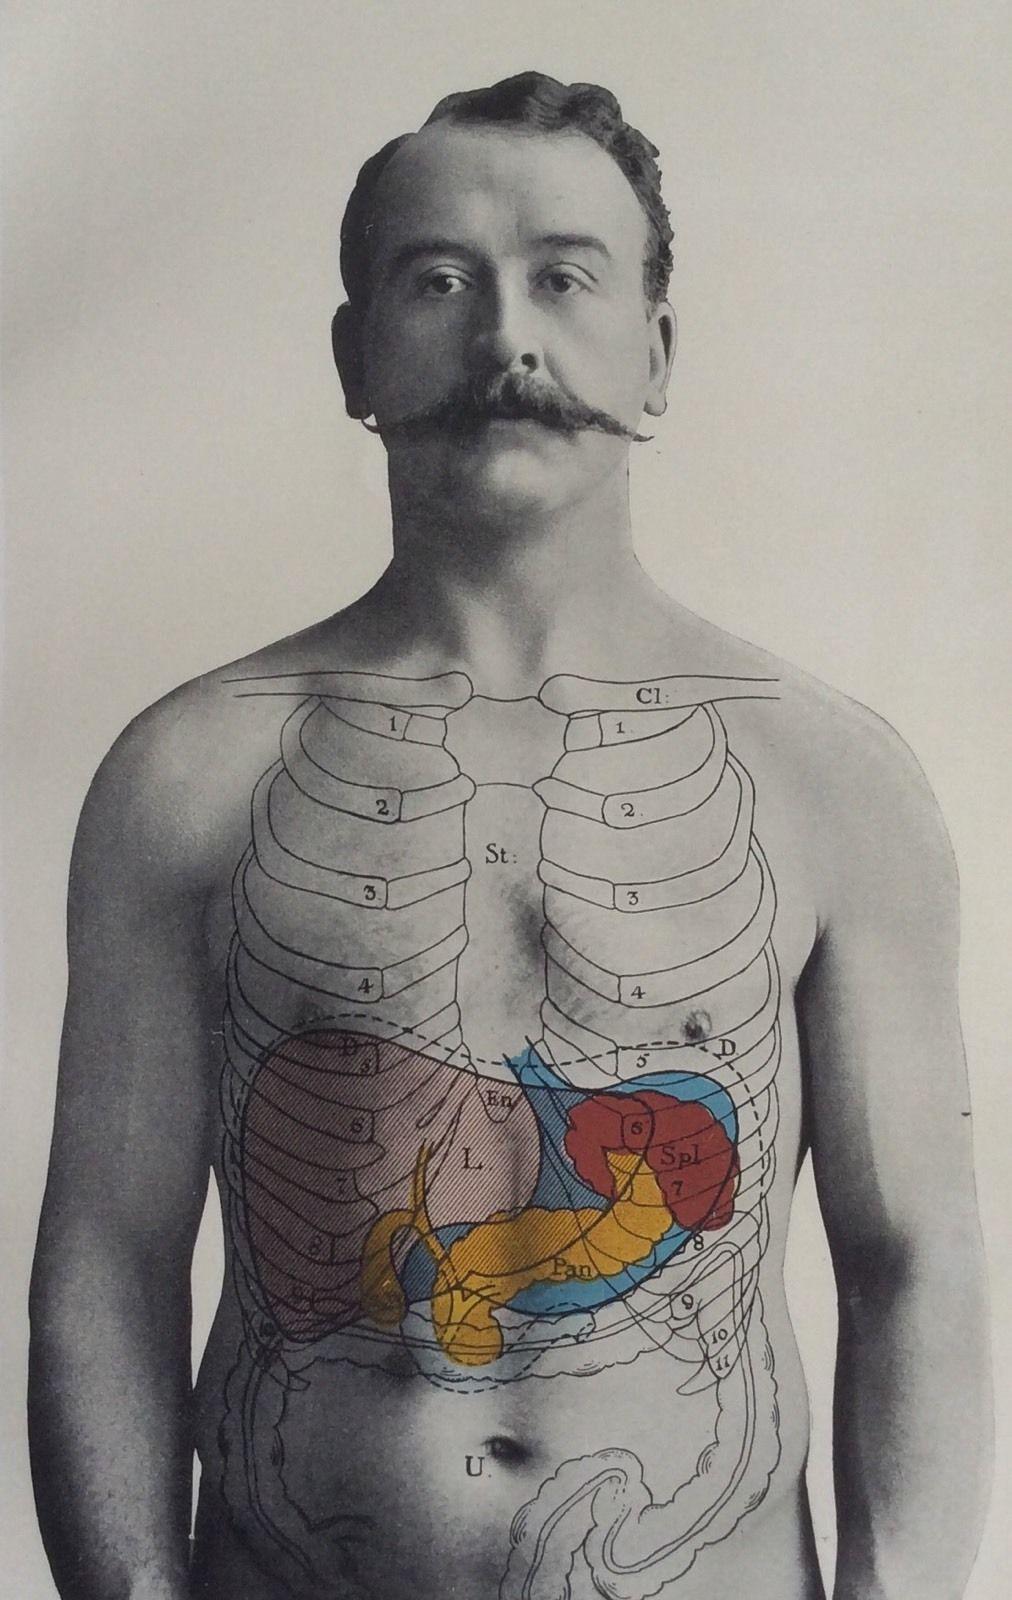 Antique 1900 Medical Diagram Print Human Anatomy Liver Spleen